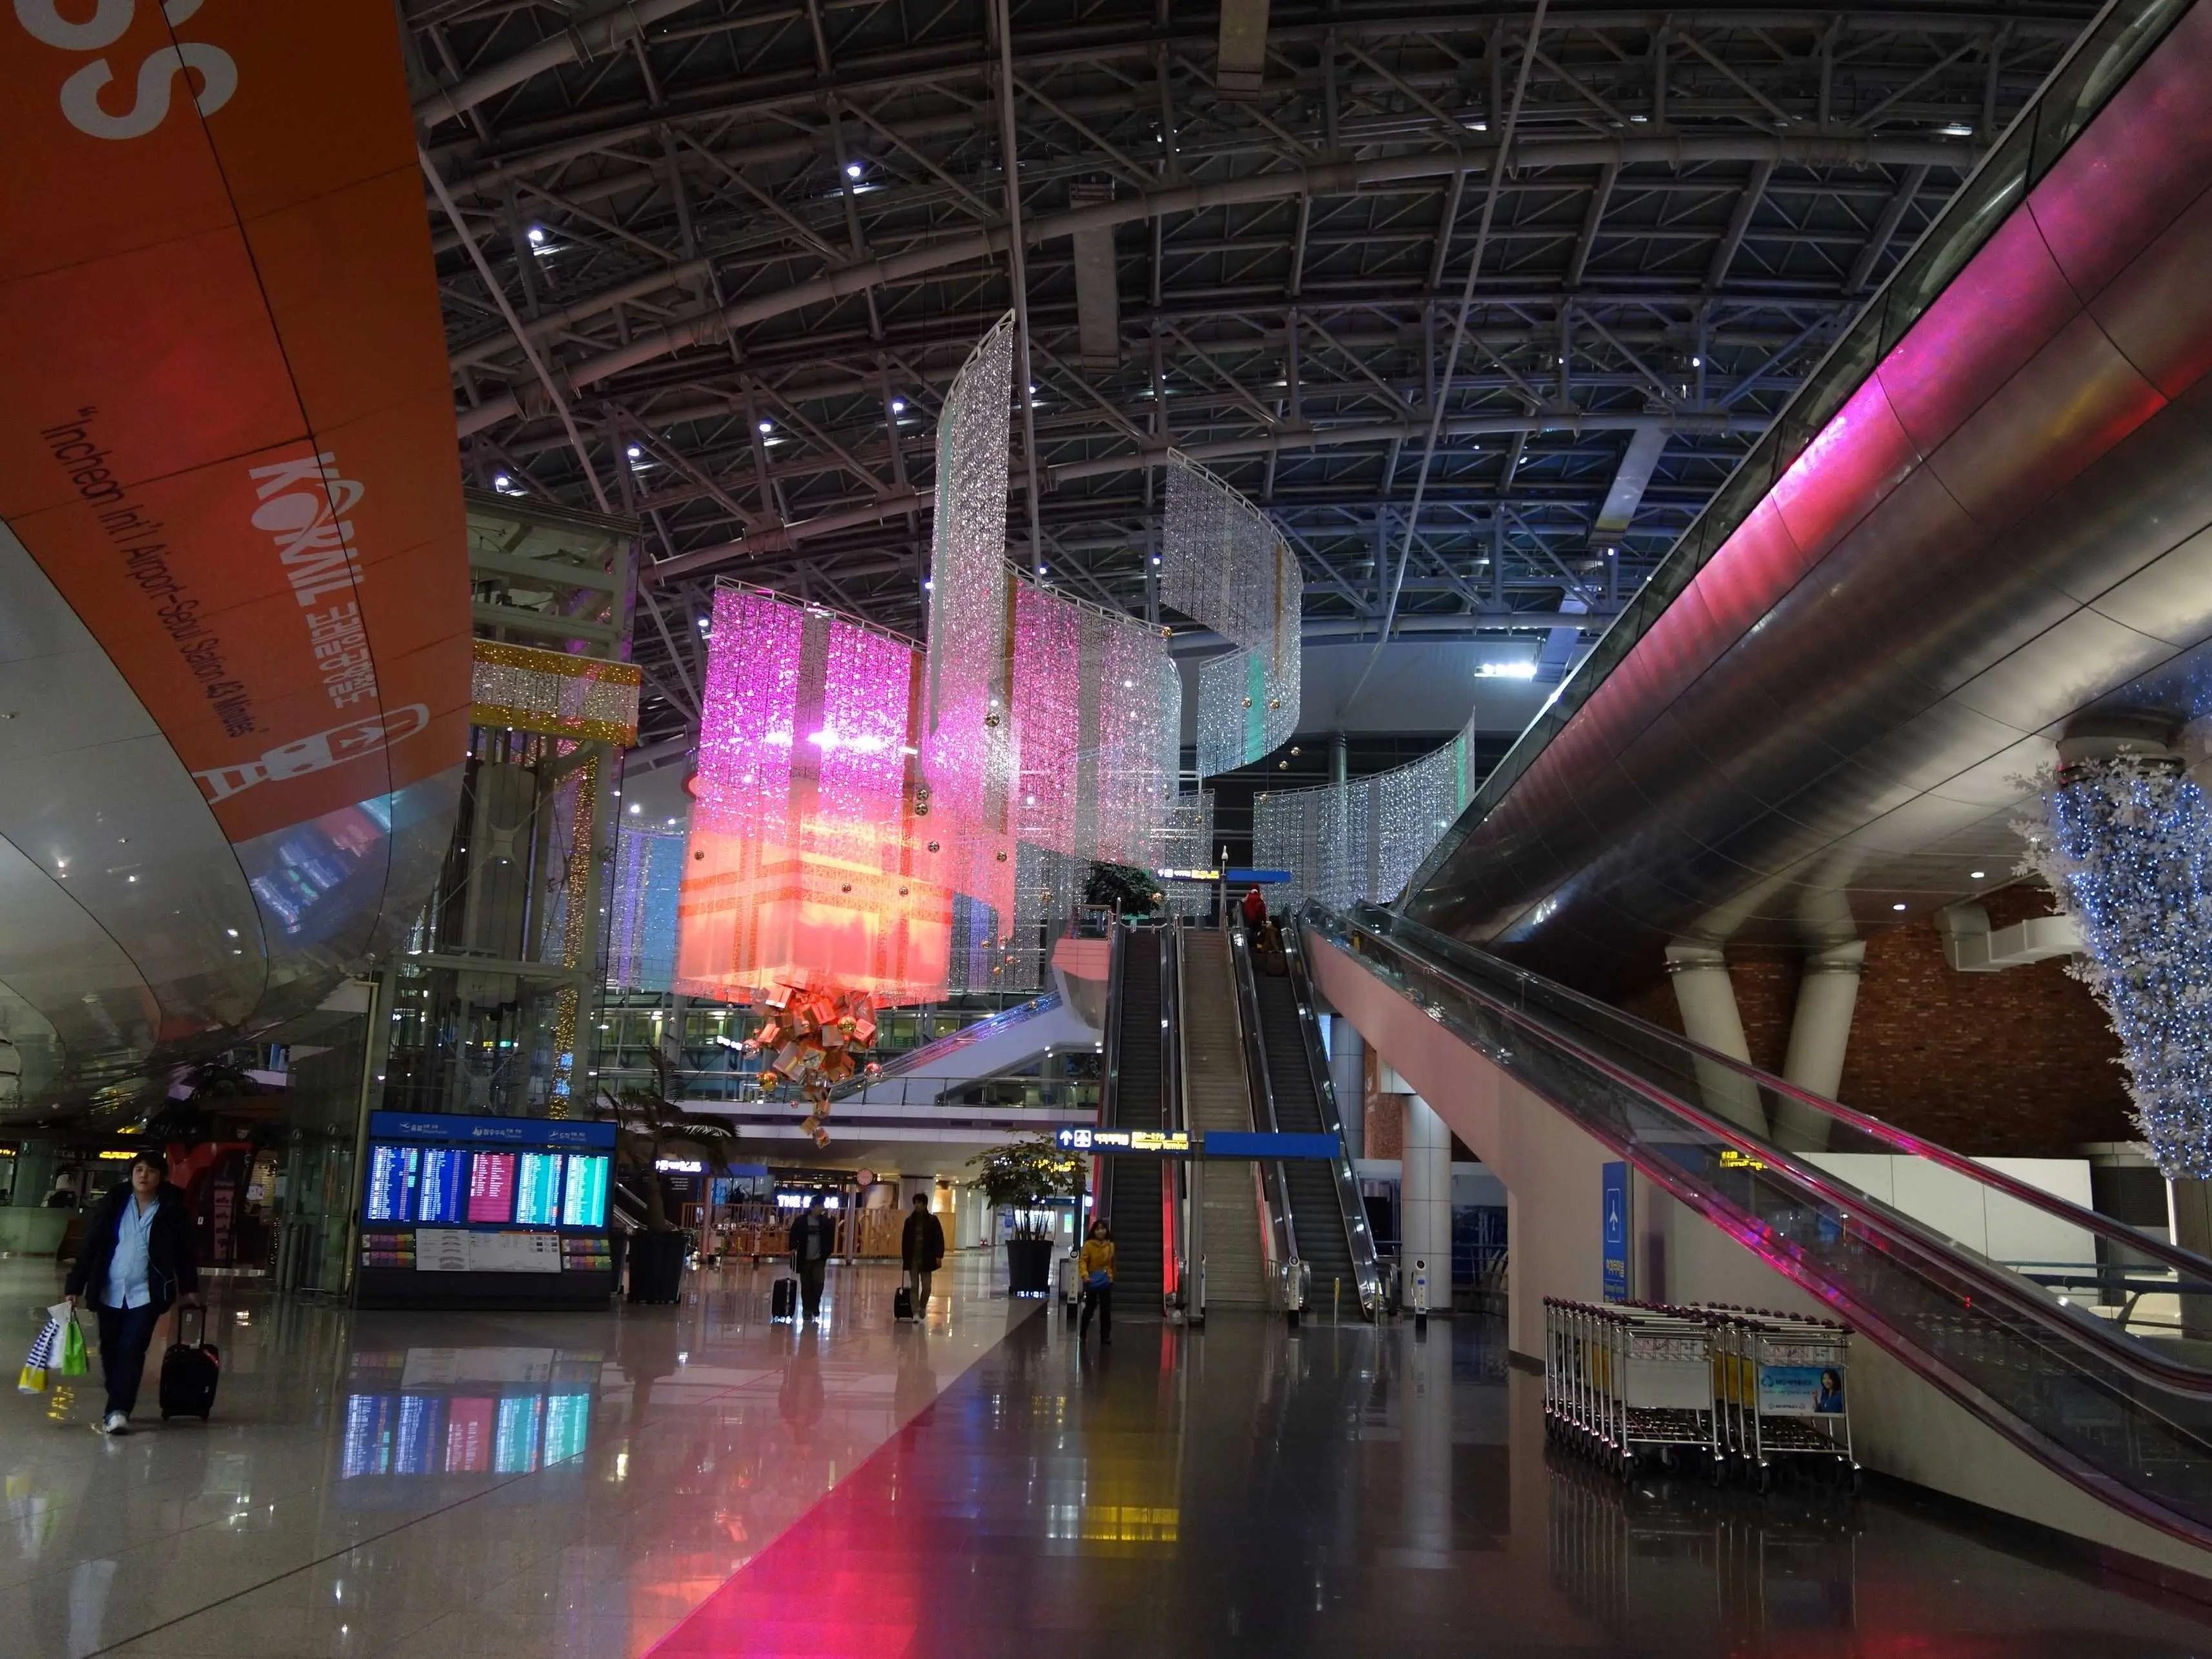 2. Incheon International Airport (ICN)